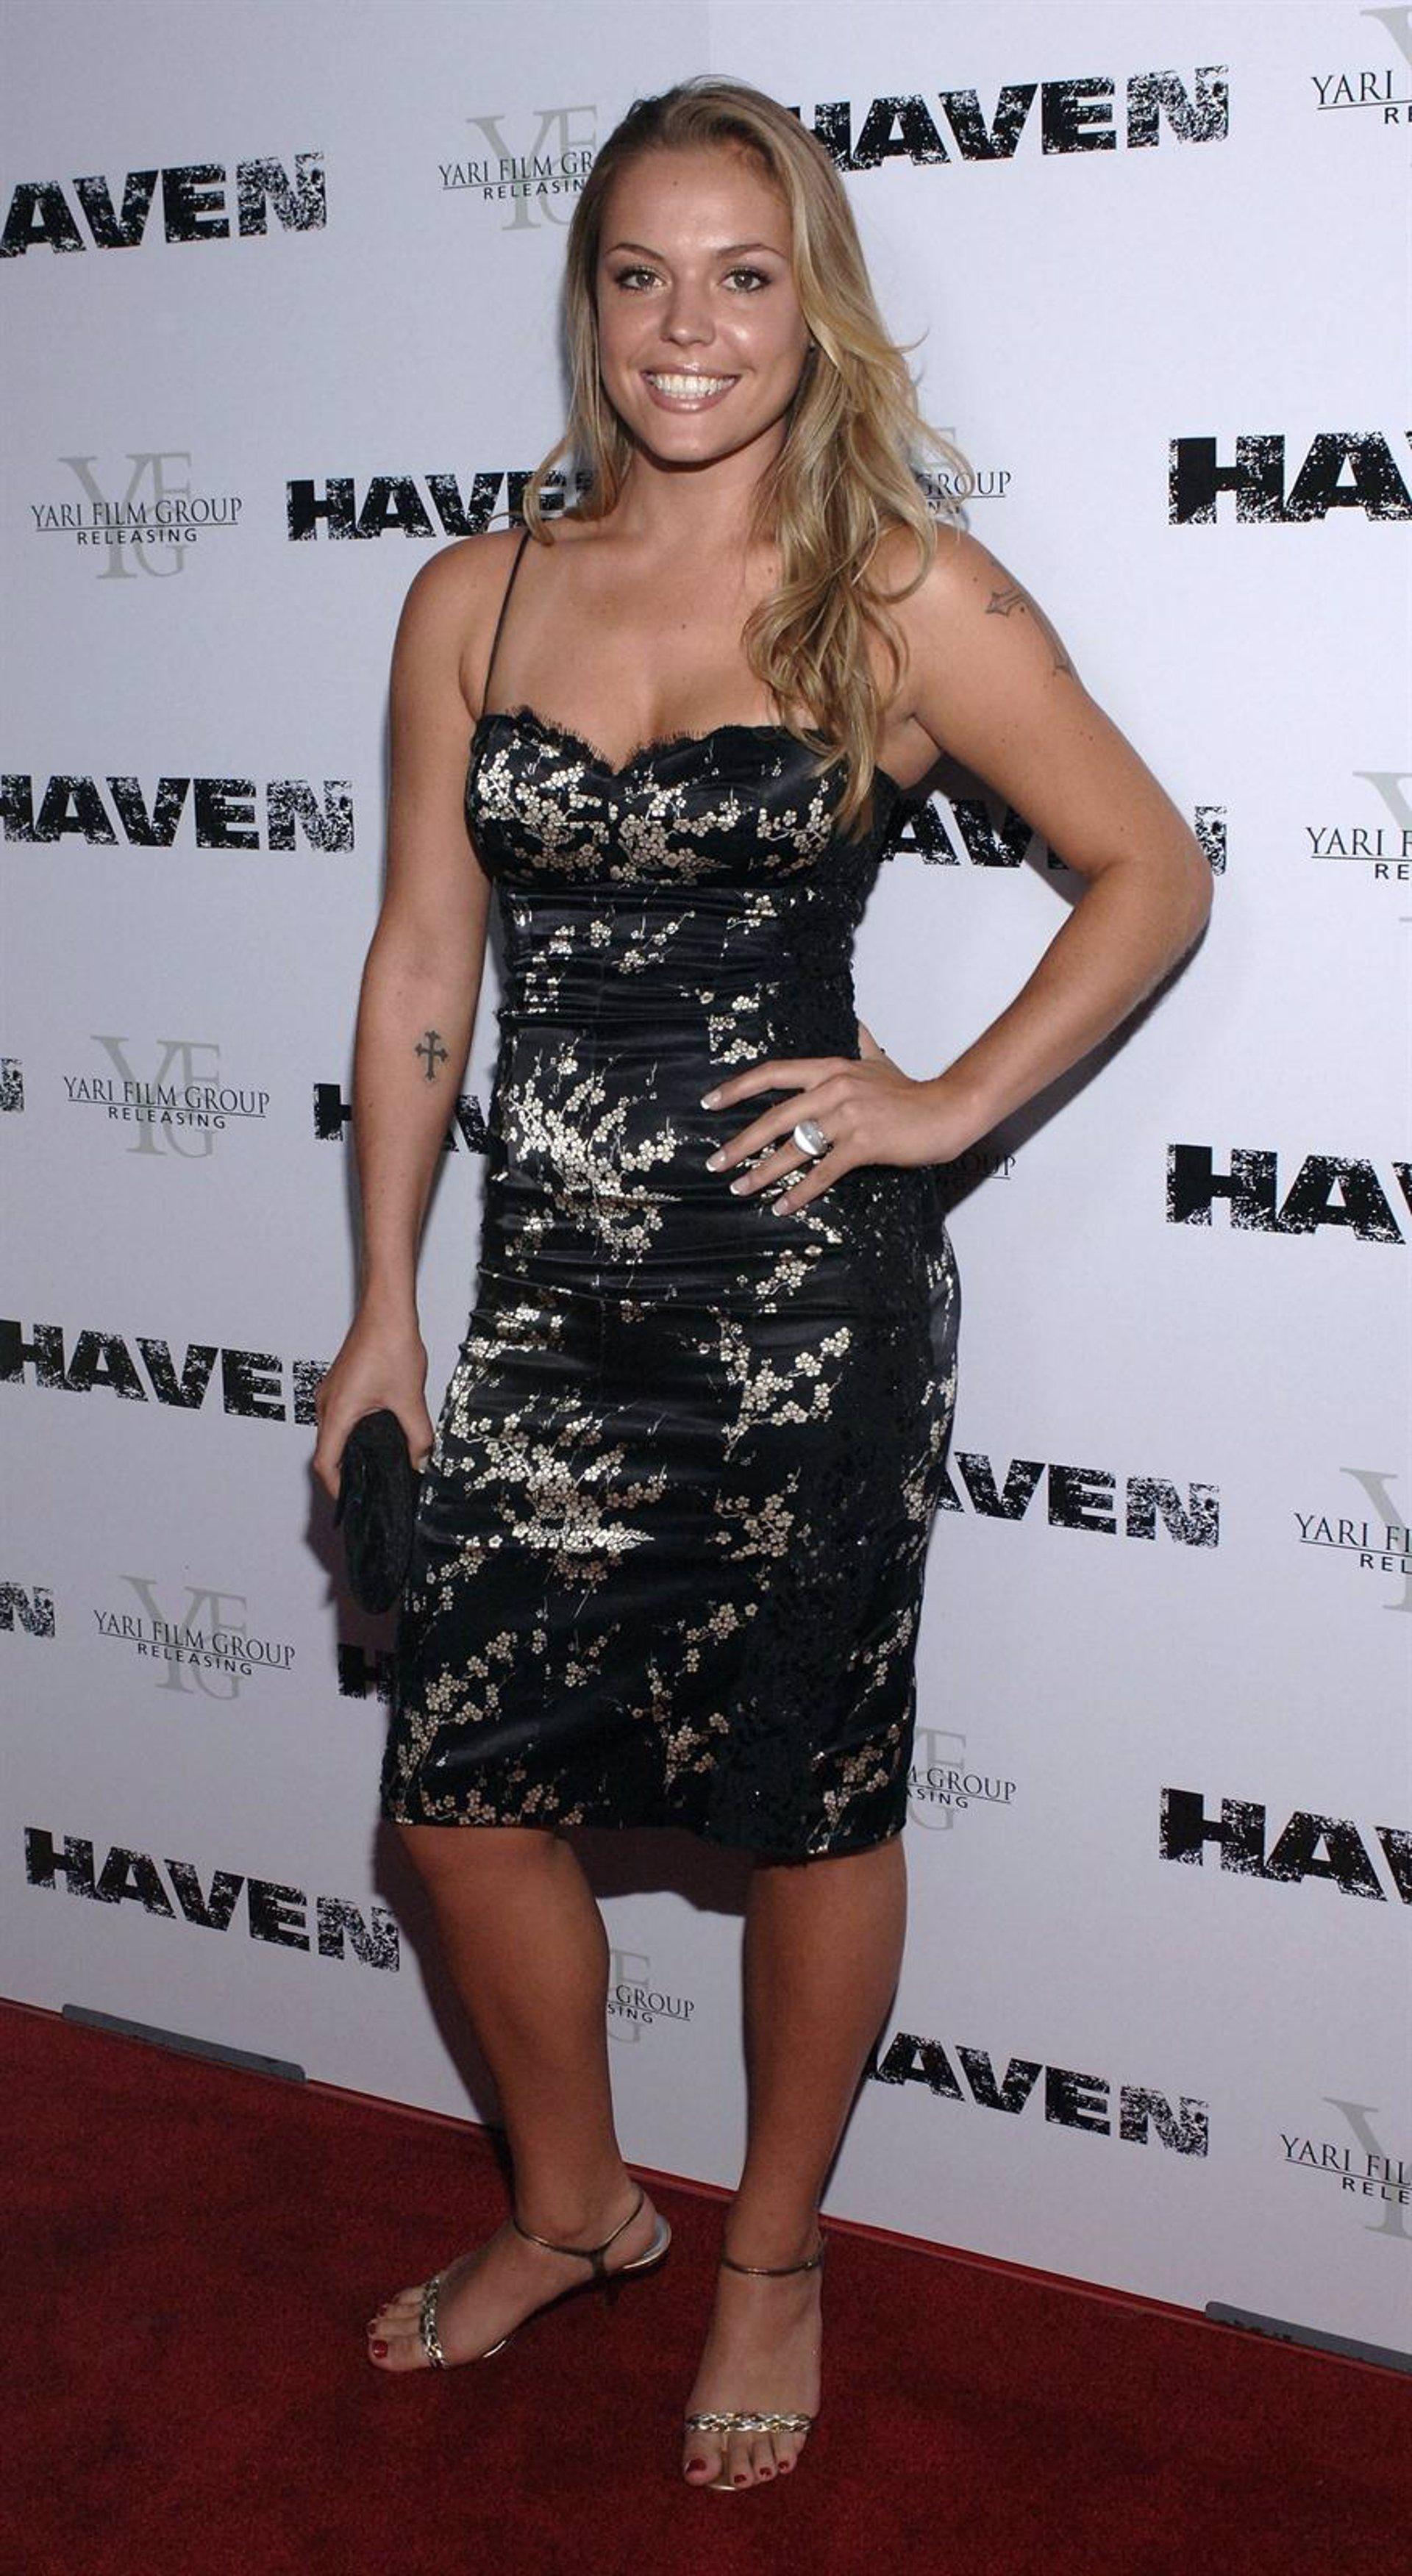 picture Lauren Harris (born 1984)